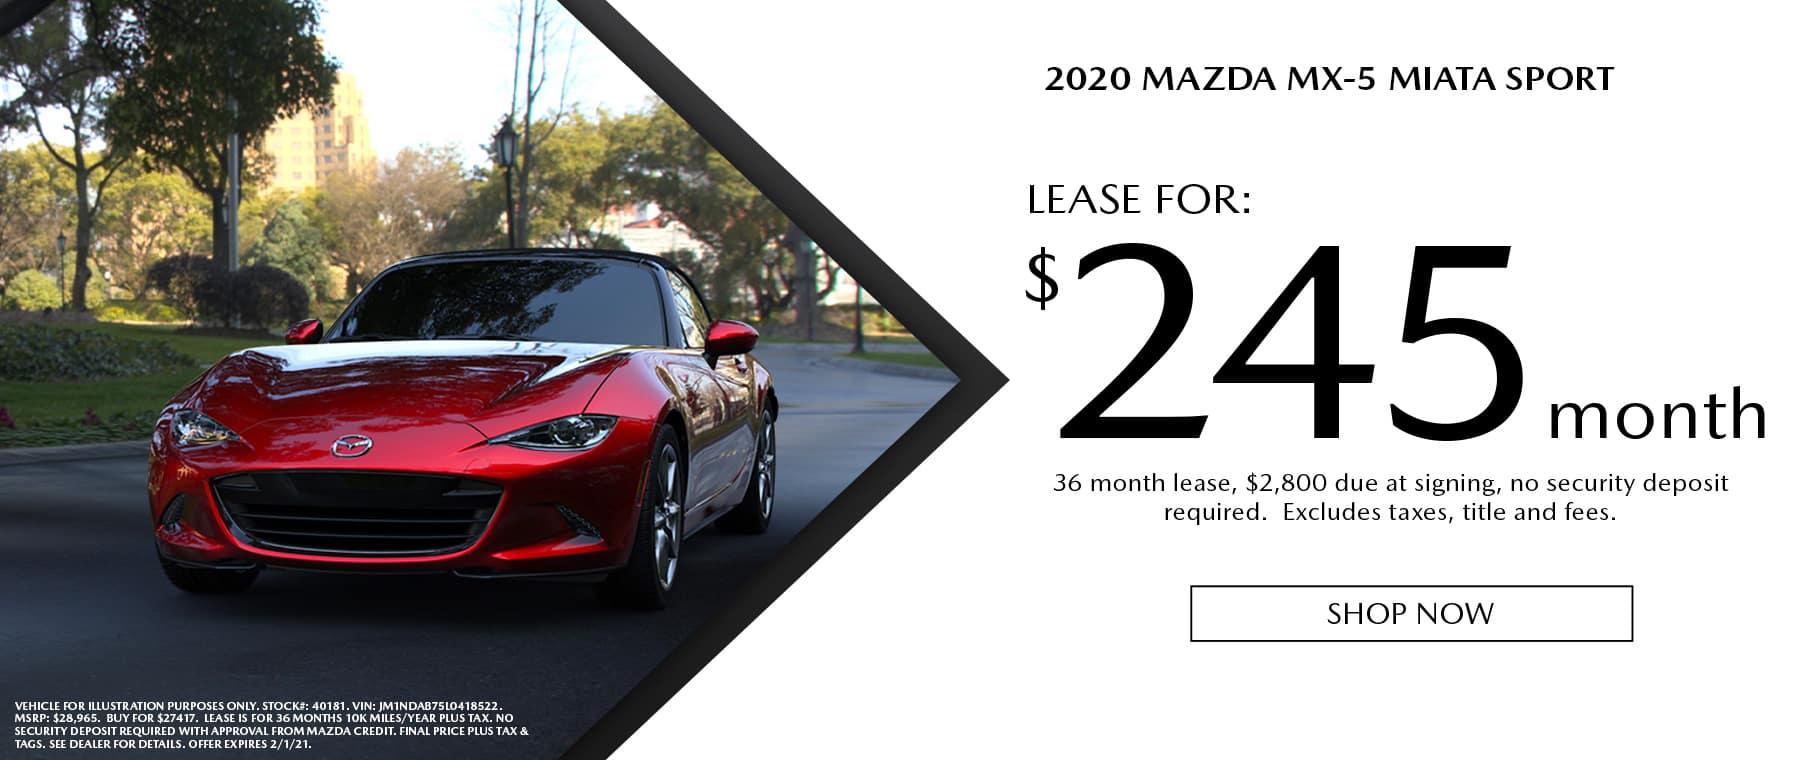 1_21_WV_Mazda_Web_Banners-2020-Miata